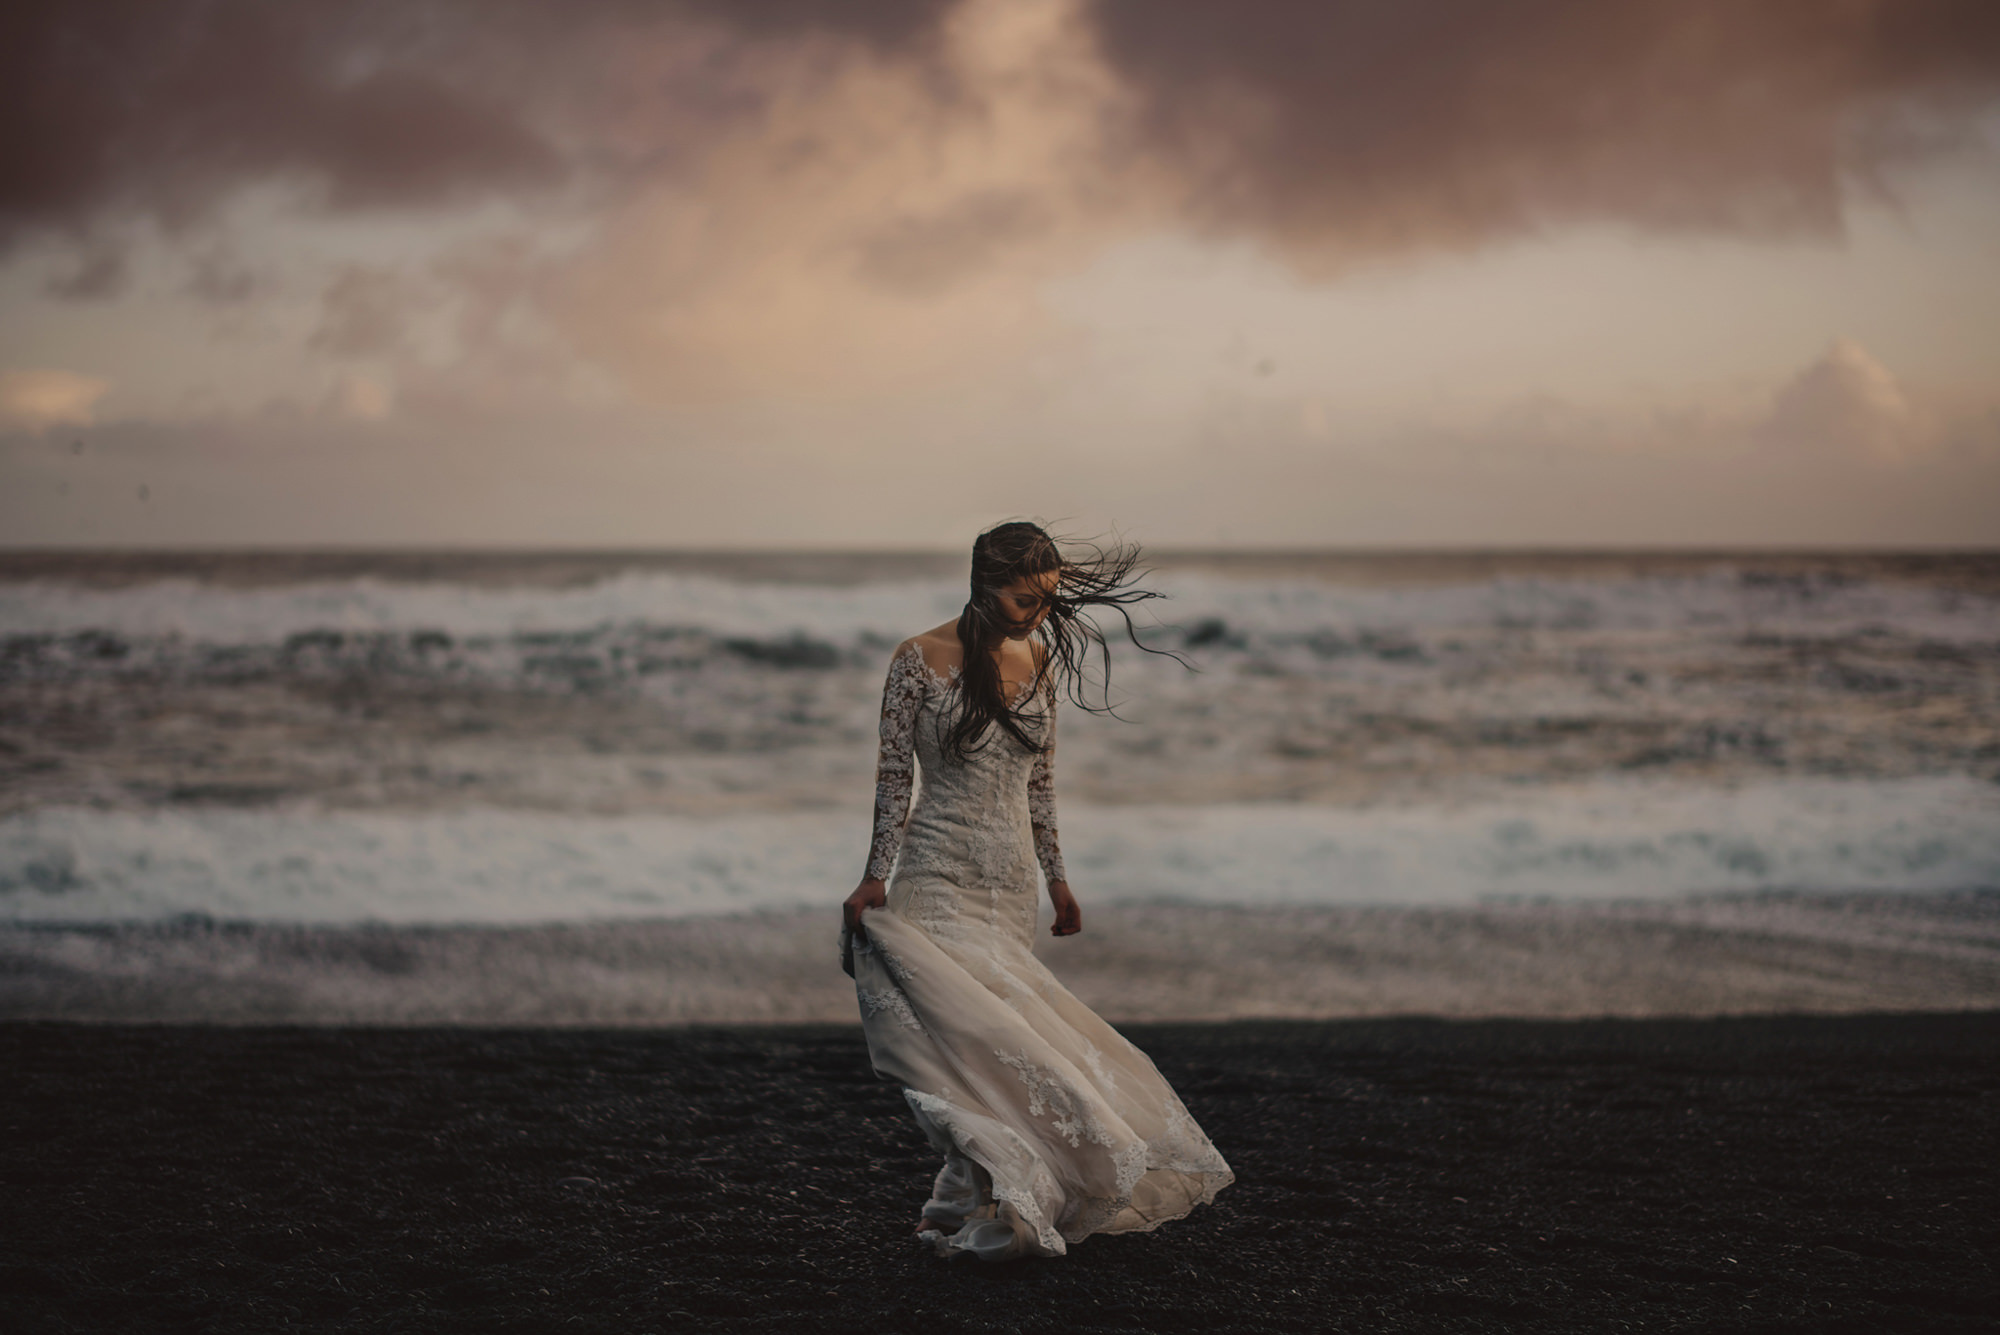 bride-walks-on-beach-with-long-sleeve-lace-trumpet-dress-worlds-best-wedding-photos-gabe-mcclintock-calgary-wedding-photographer